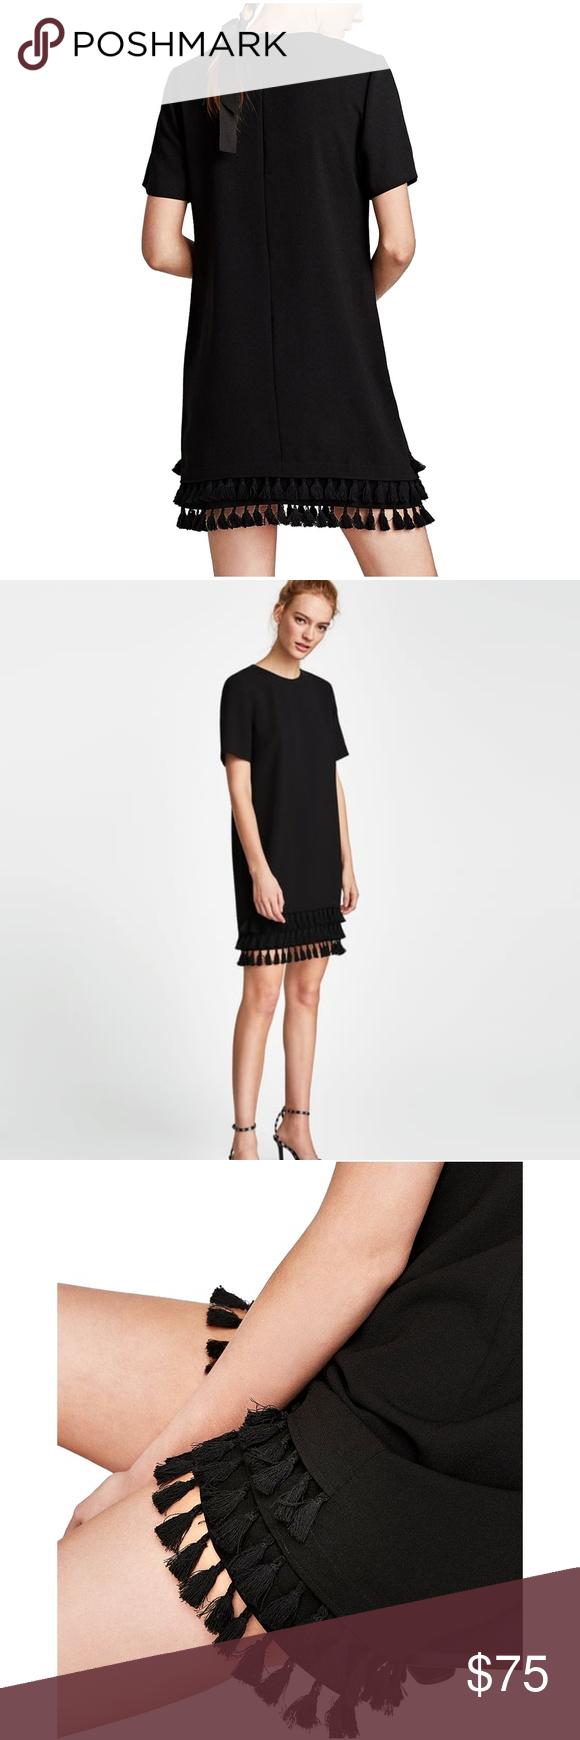 7596b620 Zara Woman Mini Dress Shift Pom Poms 9479/264 NWT Zara Woman Mini Dress  Shift